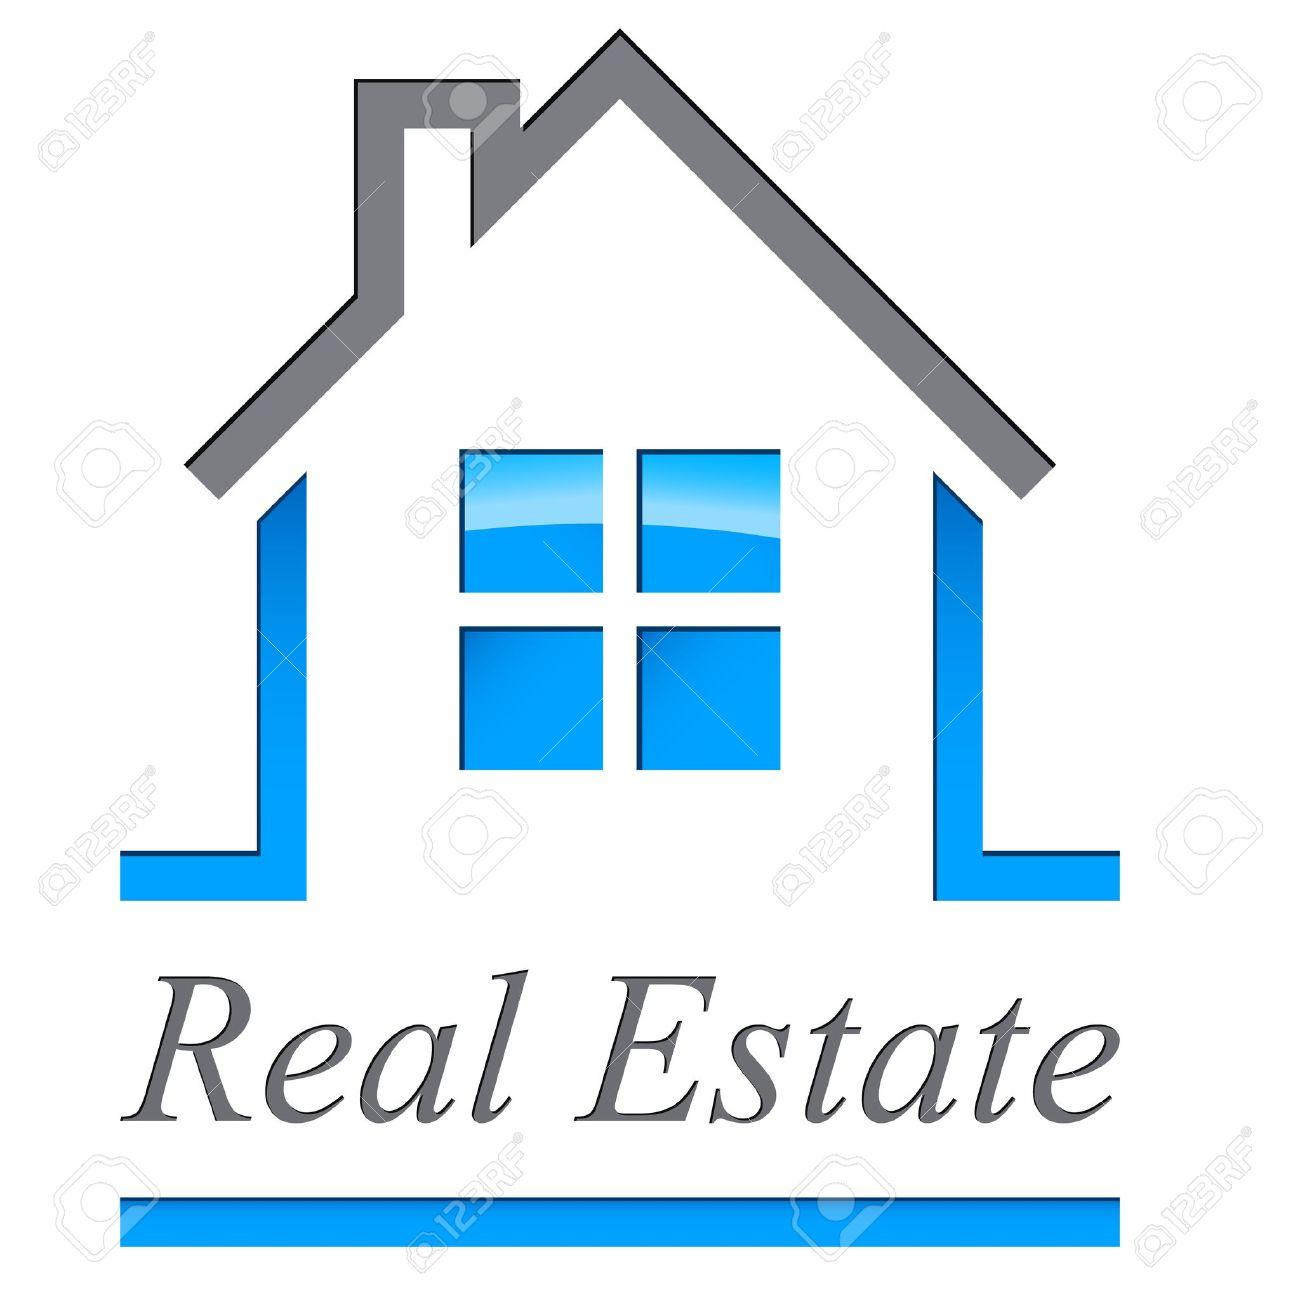 Real estate broker clipart.